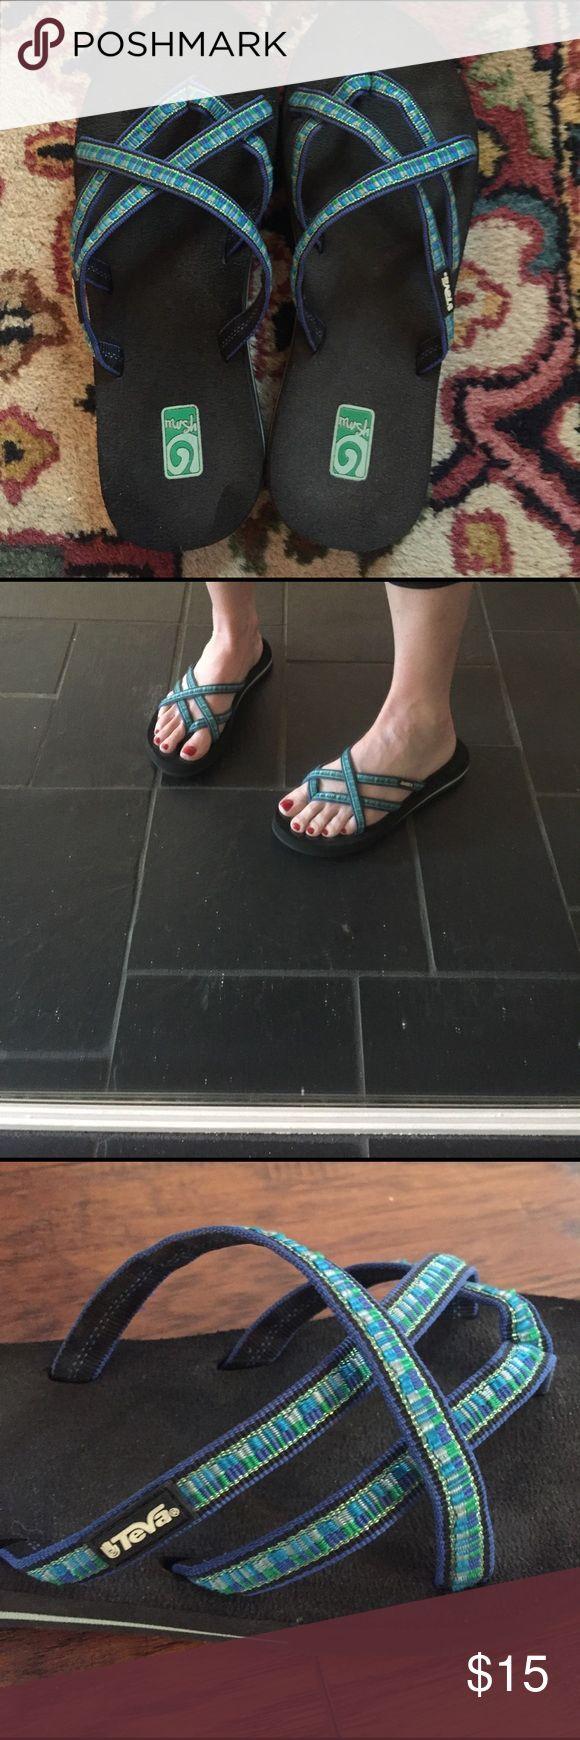 Teva flip-flop sandal. Bright blue pattern, 8 Teva flip-flop sandal. Bright blue pattern, women's 8, good condition. Teva Shoes Sandals